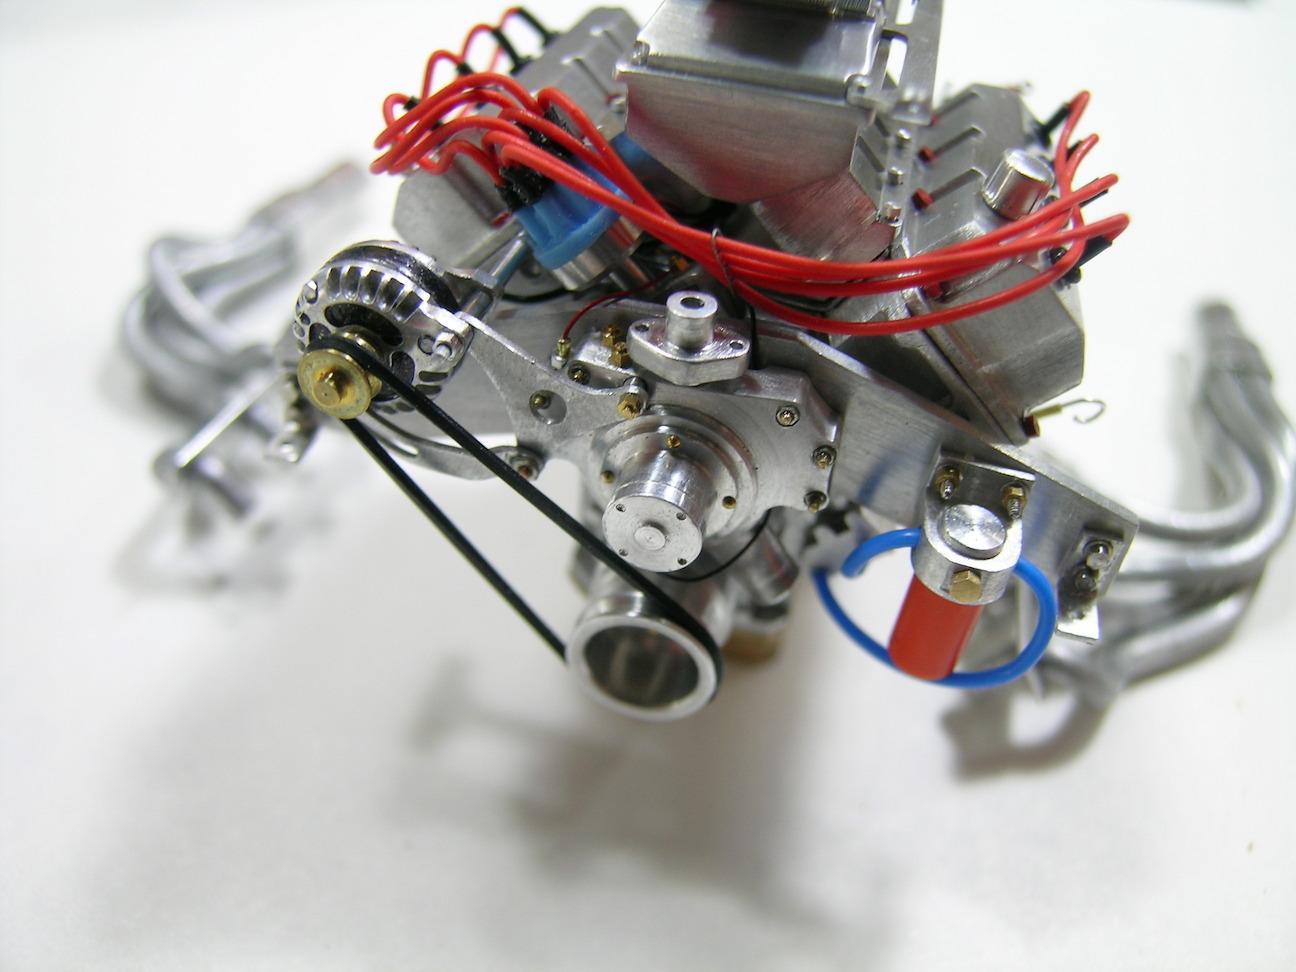 11-Engine_Front.JPG.d8e5c24354239e4568d48a3001ed911c.JPG